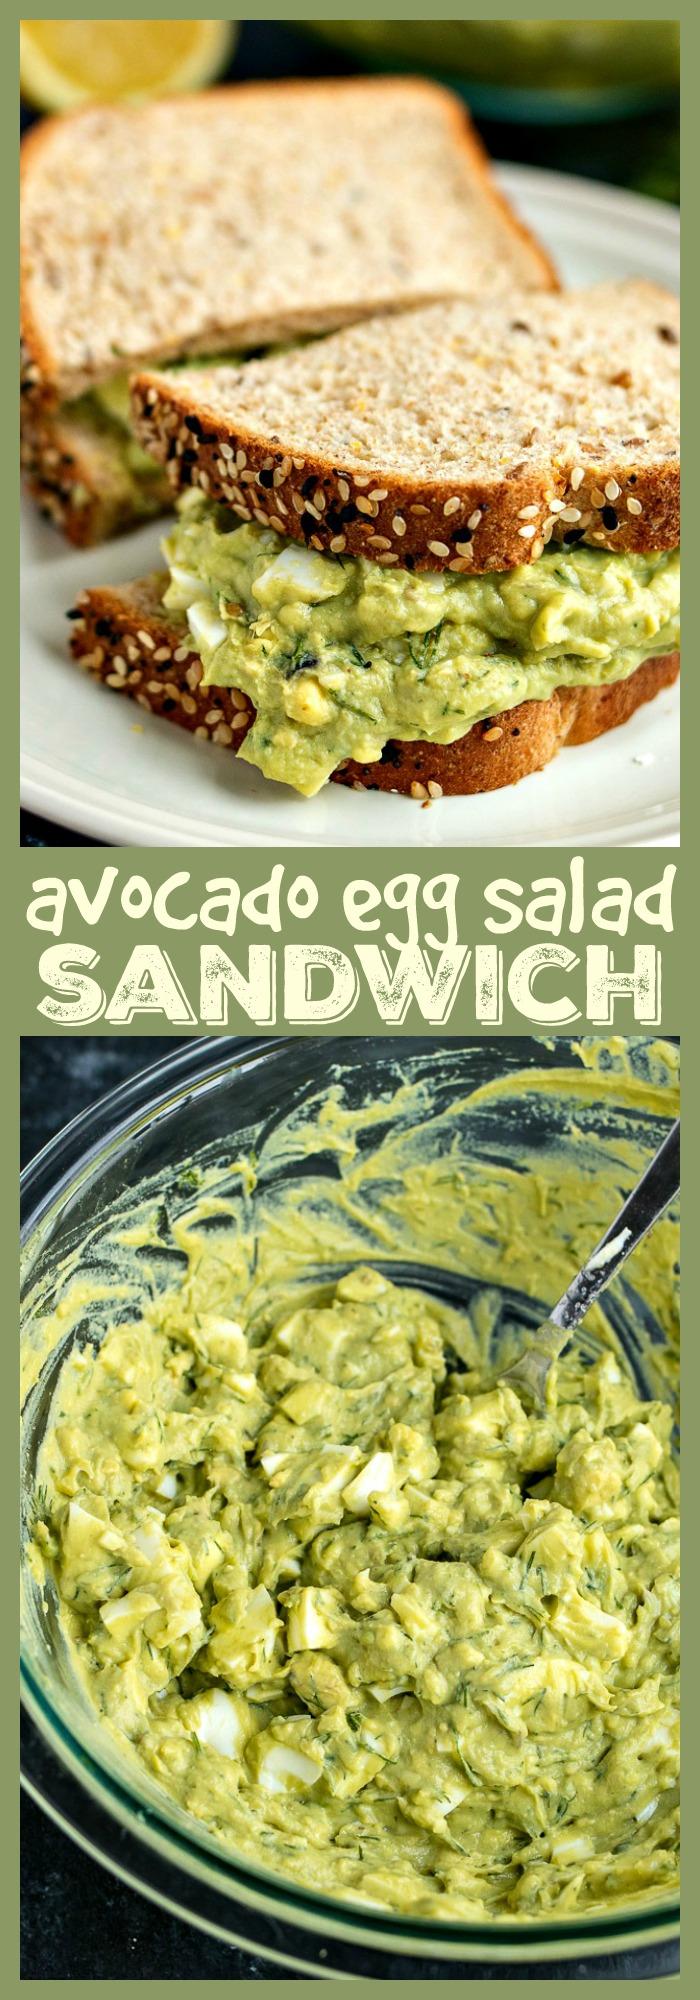 Avocado Egg Salad Sandwich photo collage